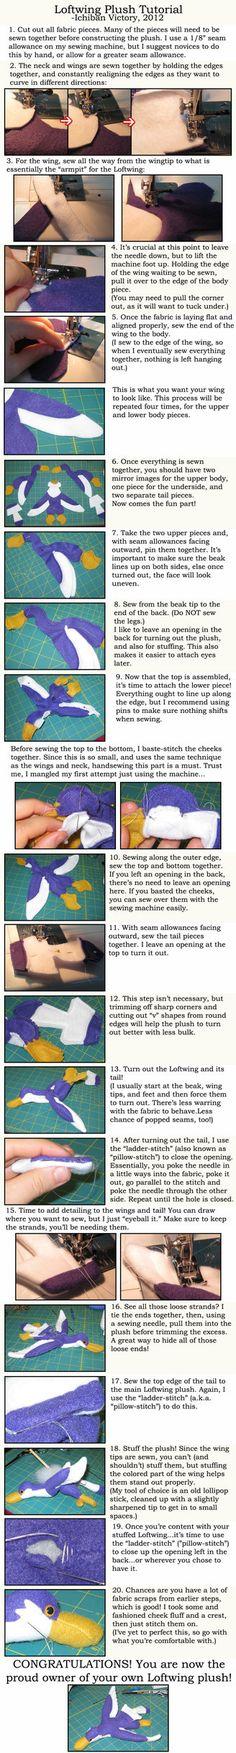 Loftwing Plush Tutorial by IchibanVictory